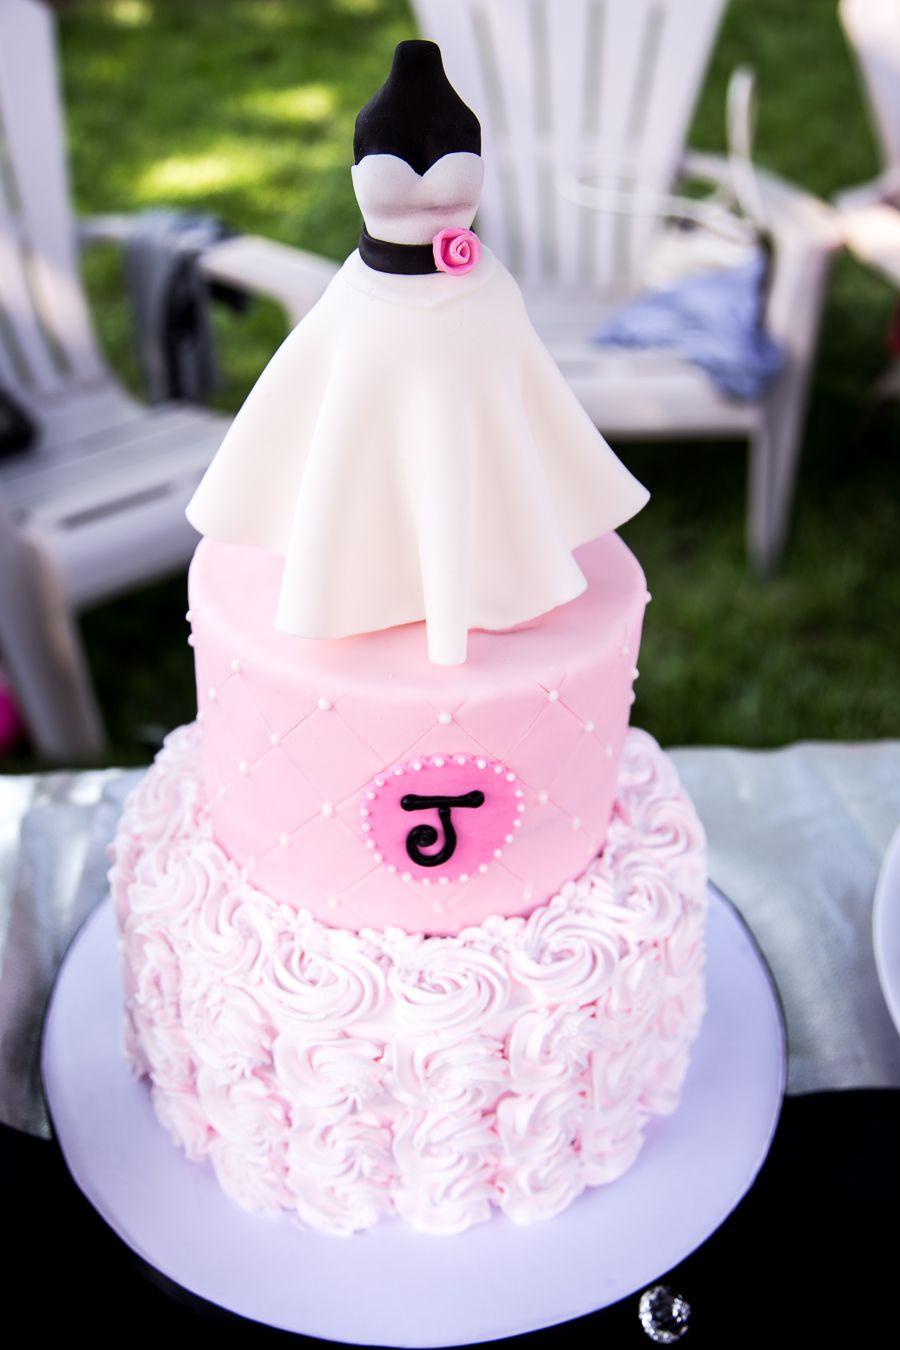 Wedding Shower Dress Cake | Bridal-Shower-Cake-Dress-Decor.jpg | Fun ...